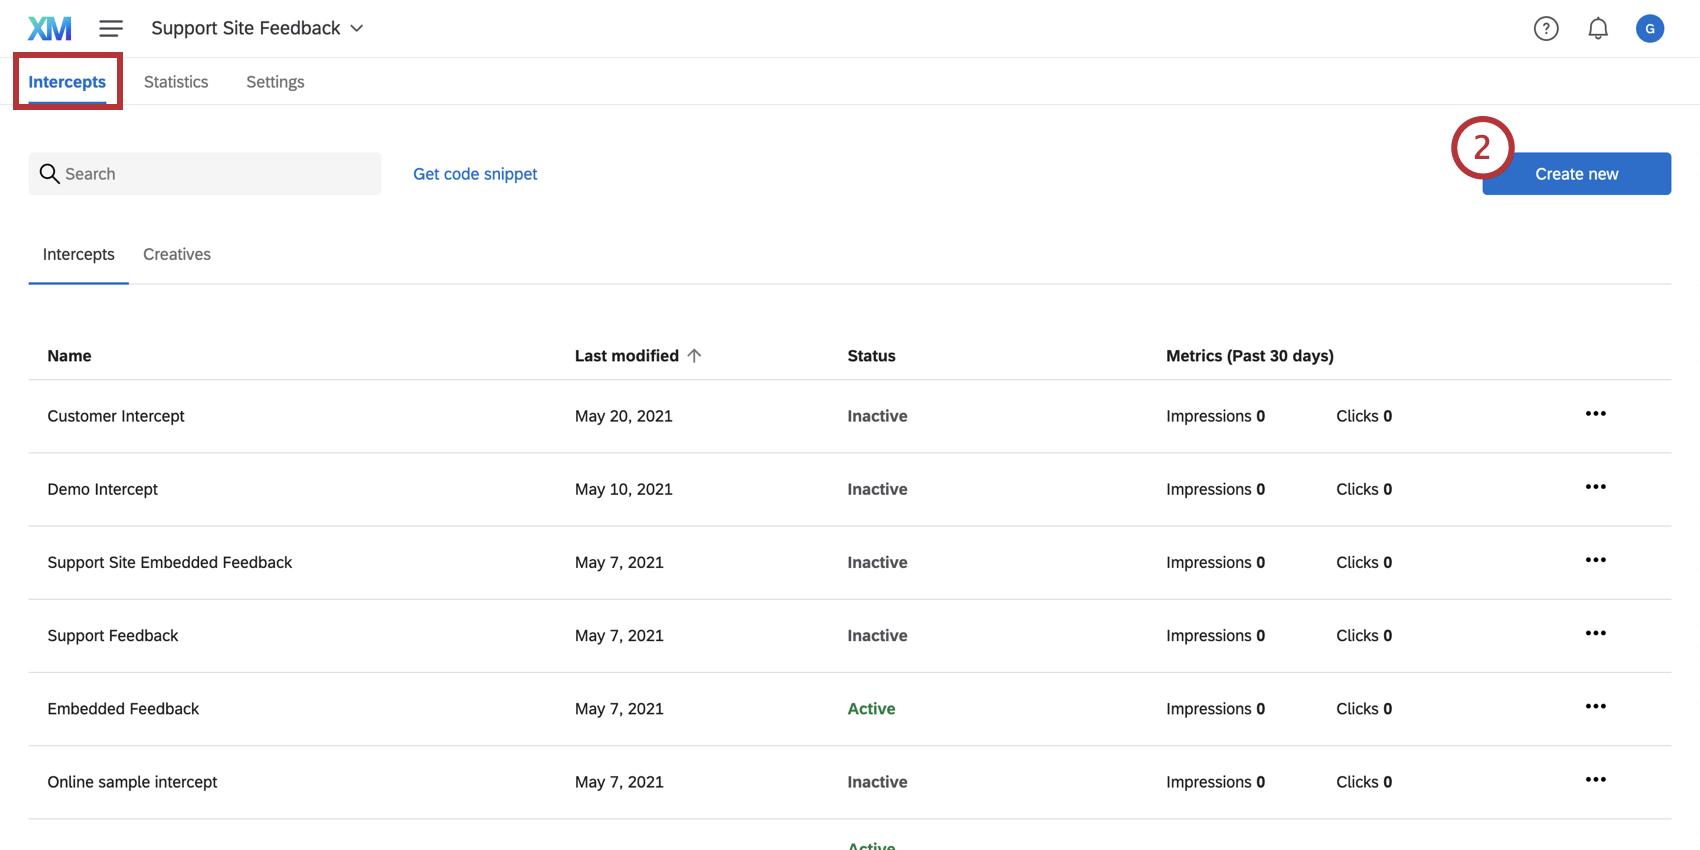 Creating a new intercept under the Intercepts tab